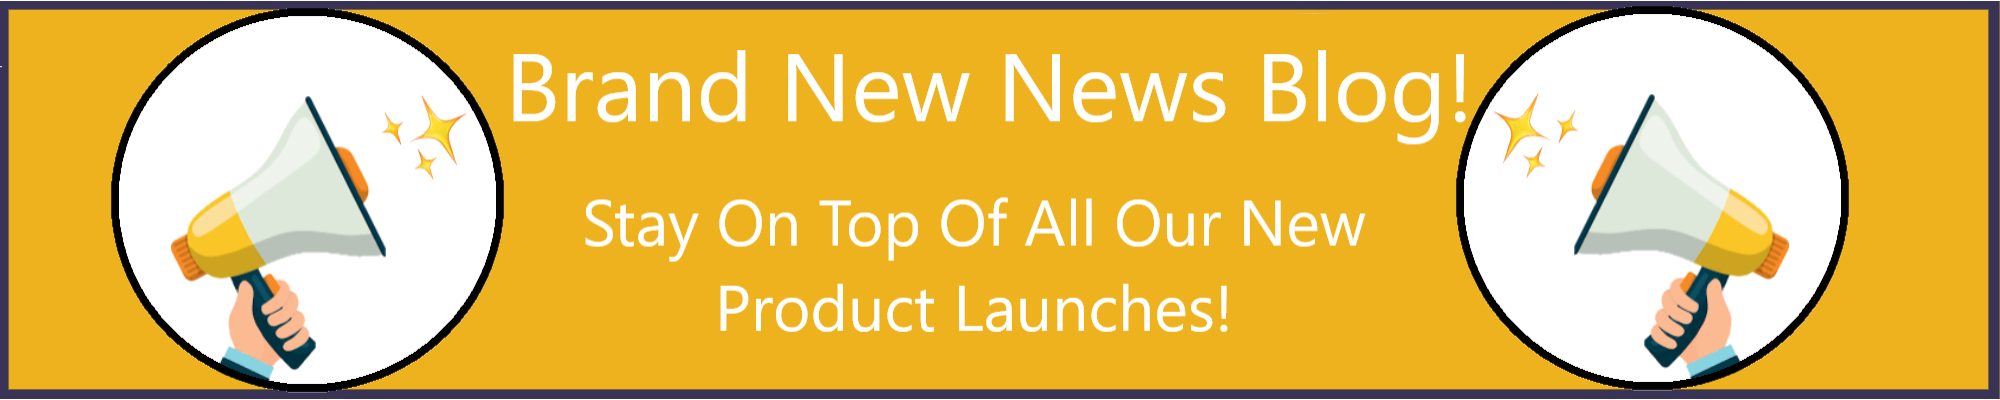 Blog, News, New Products, Social Media